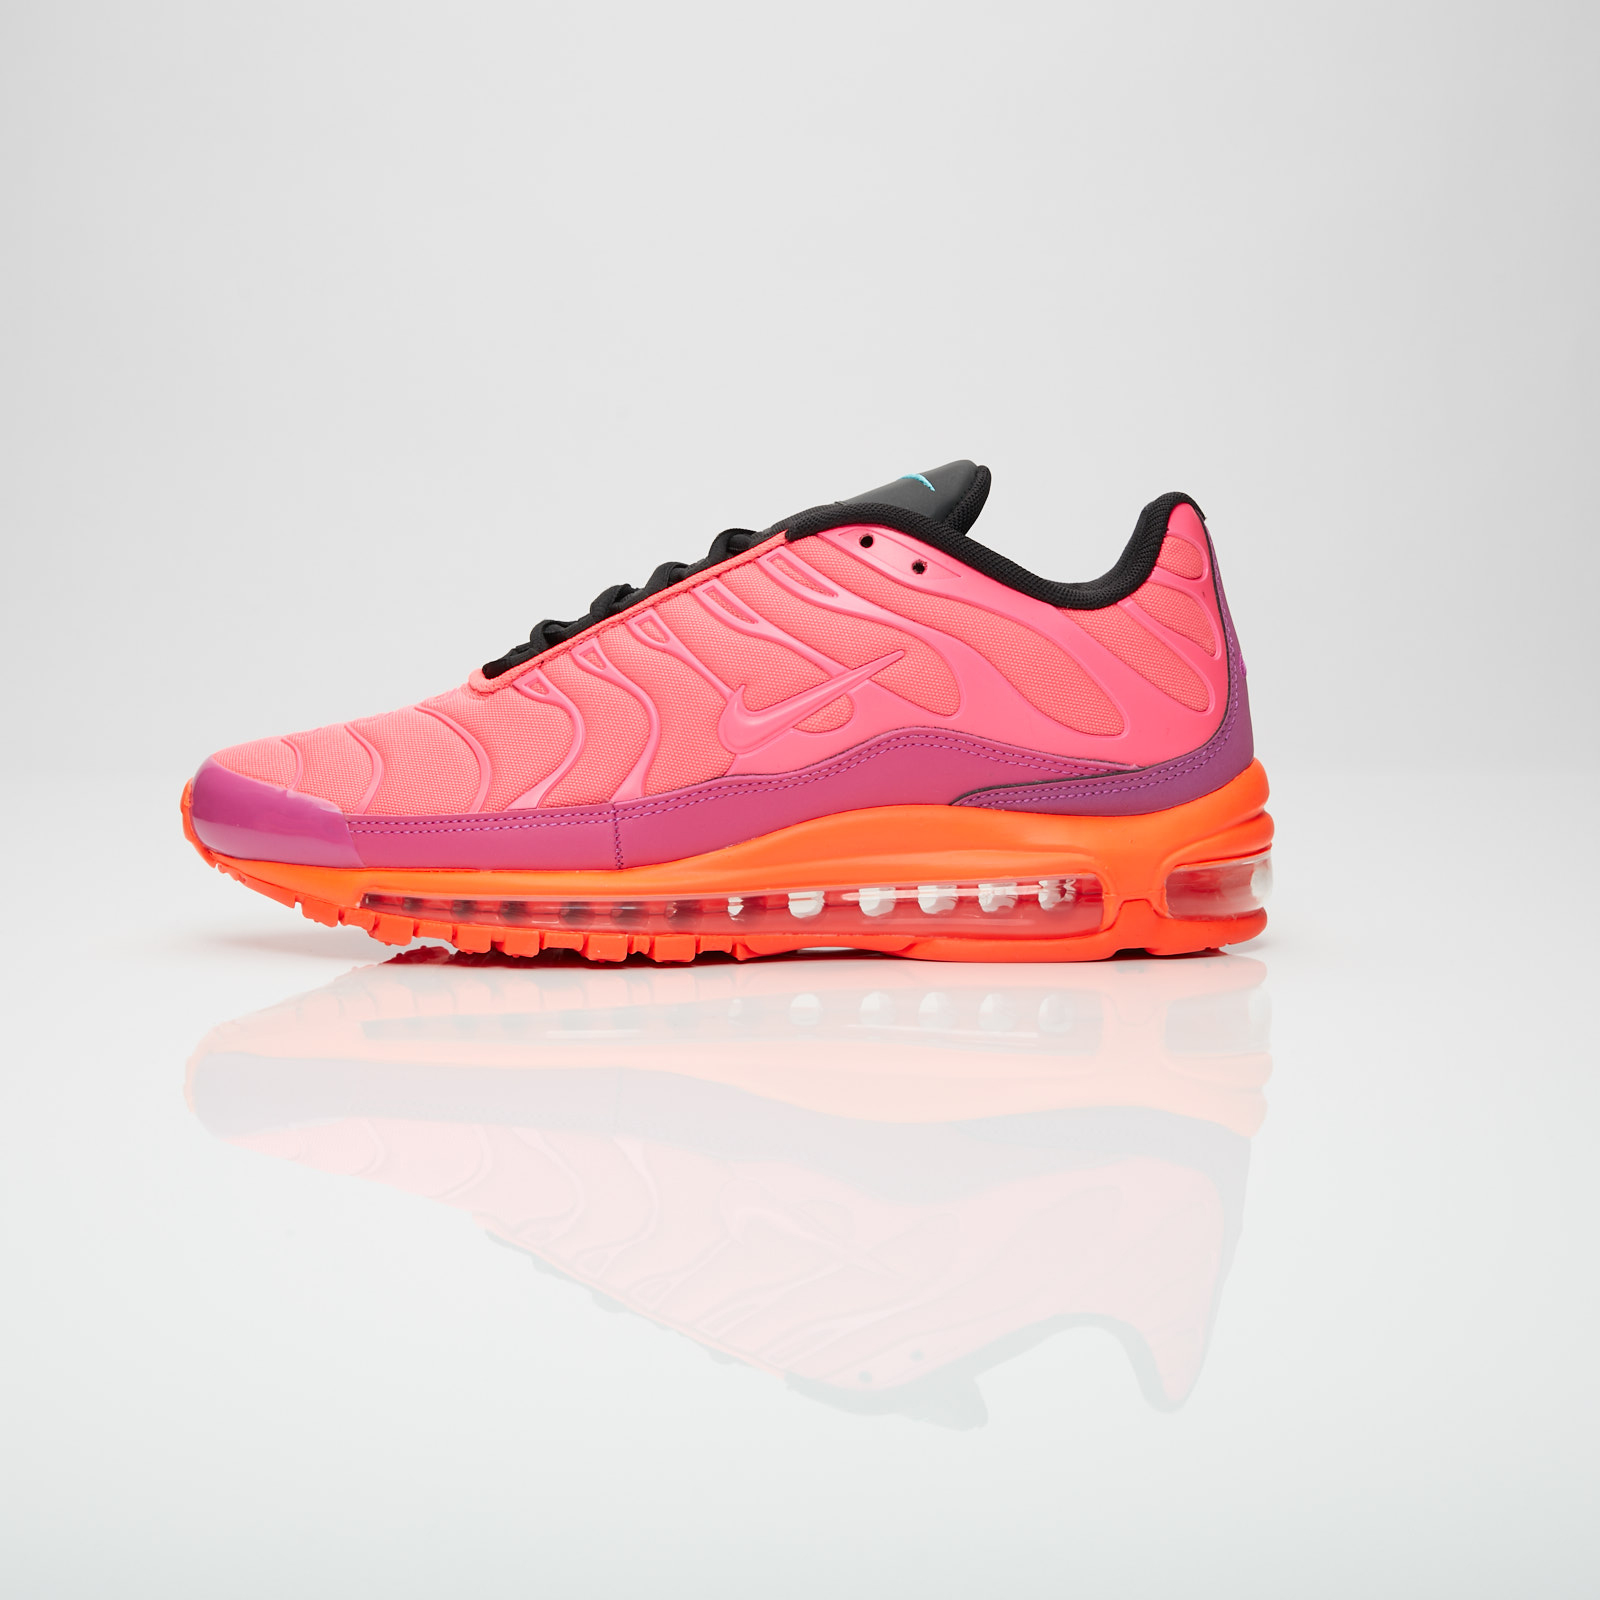 3cf02216037f Nike Air Max 97 Plus - Ah8144-600 - Sneakersnstuff